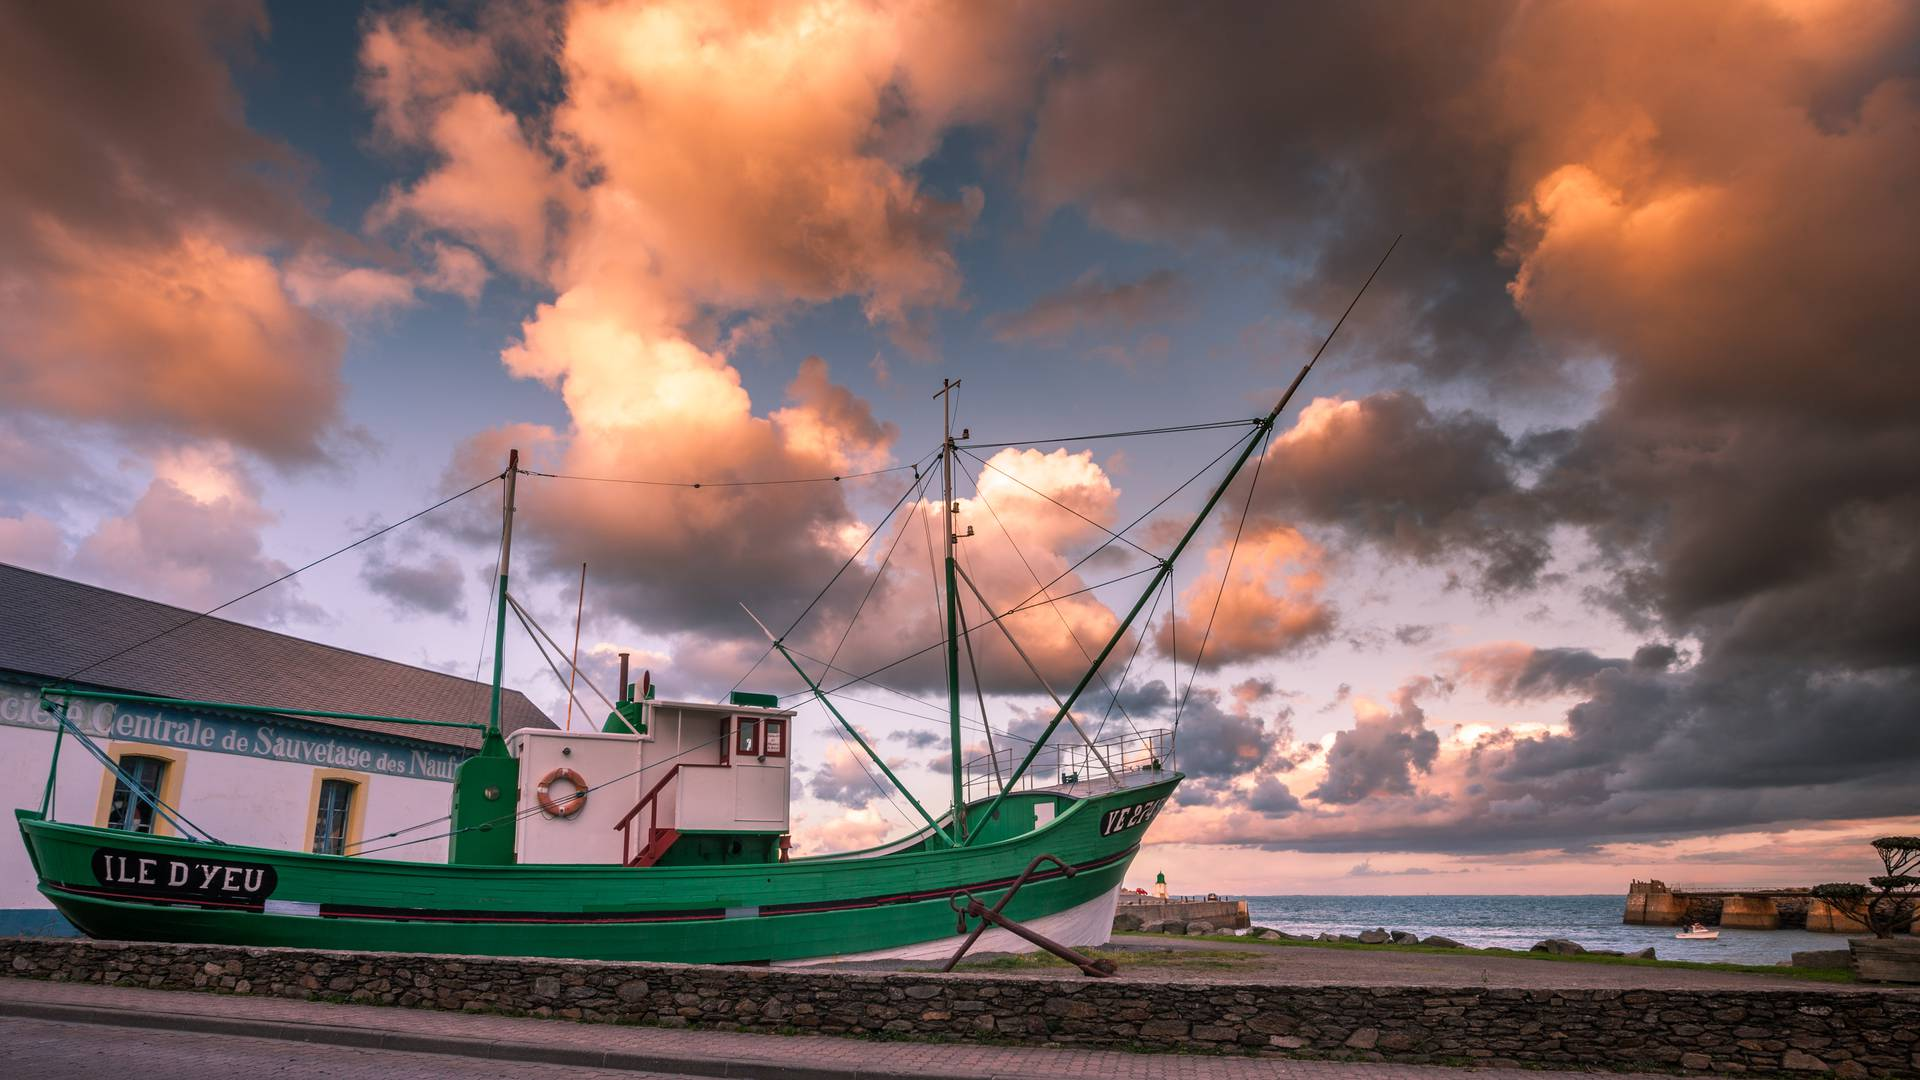 The Corsaire, tuna boat, Ile d'Yeu